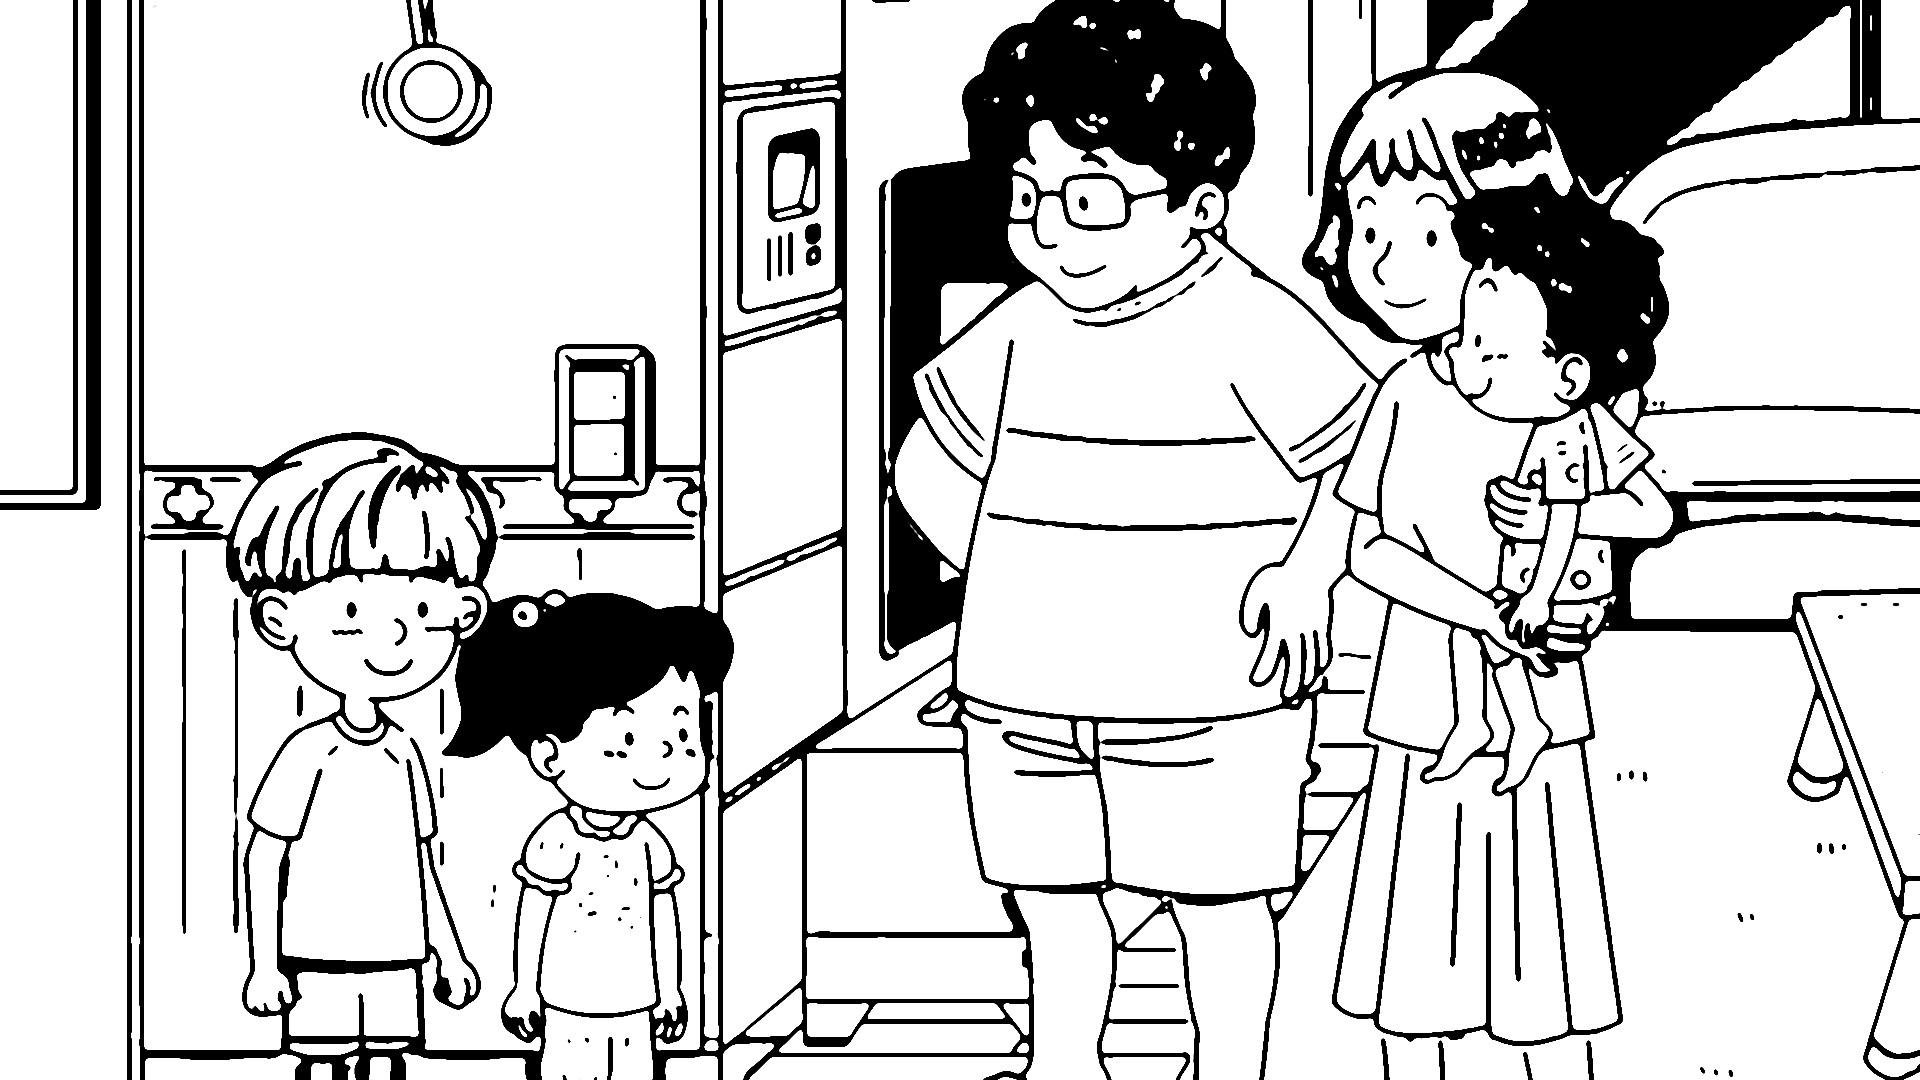 Speaking Cartoon Kids Coloring Page 45